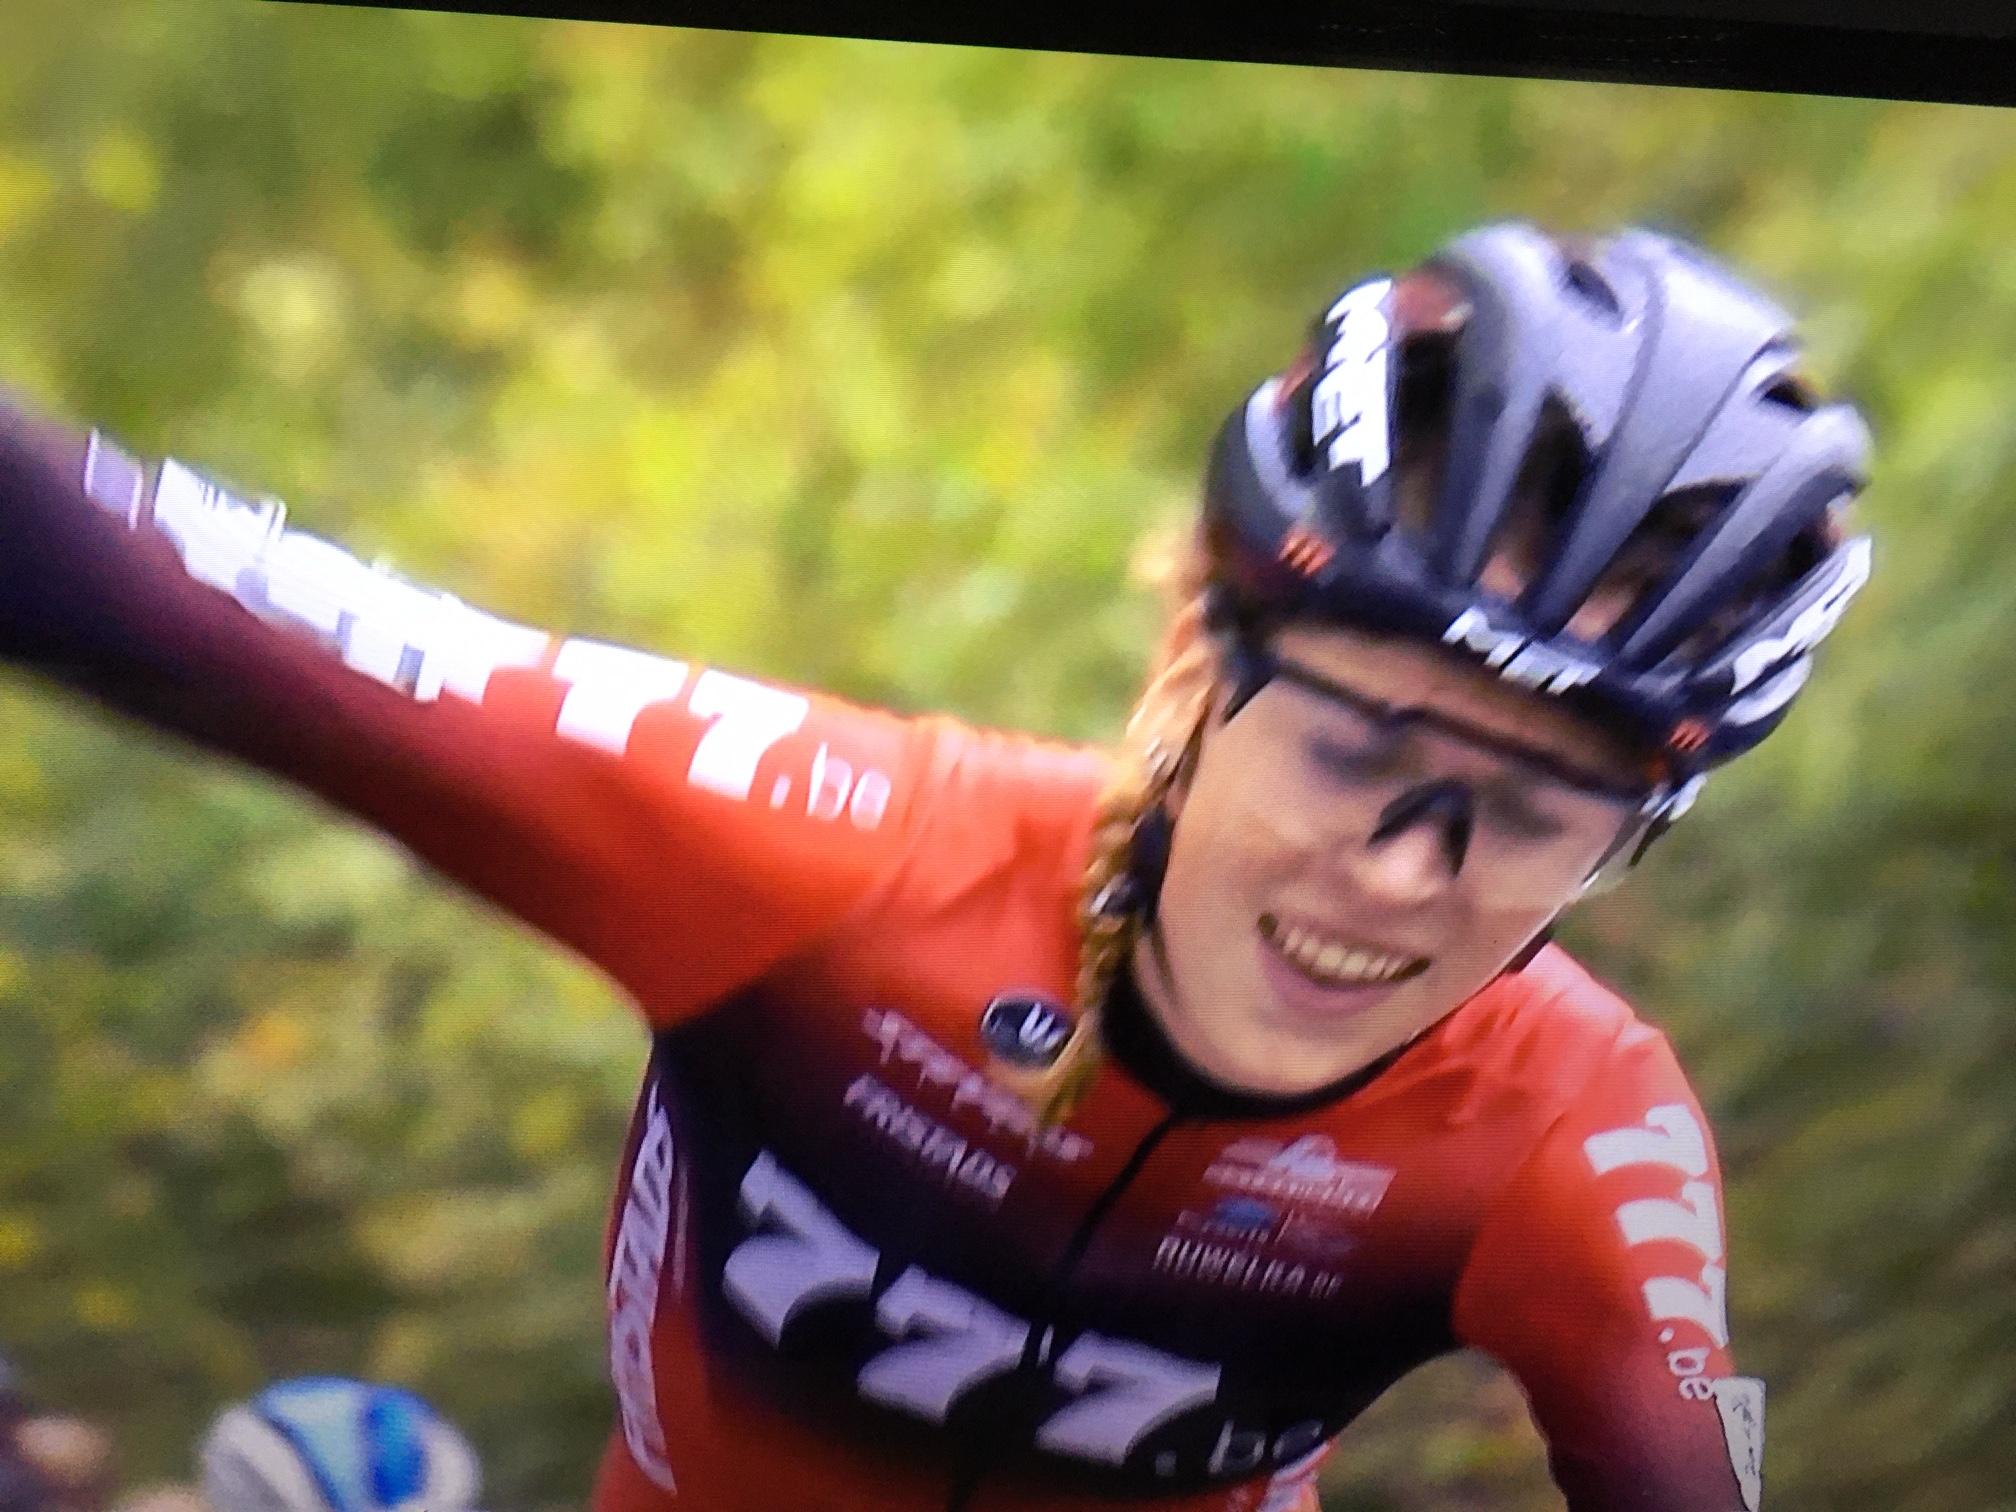 Yara Kasteleijn wint nu ook de Koppenbergcross